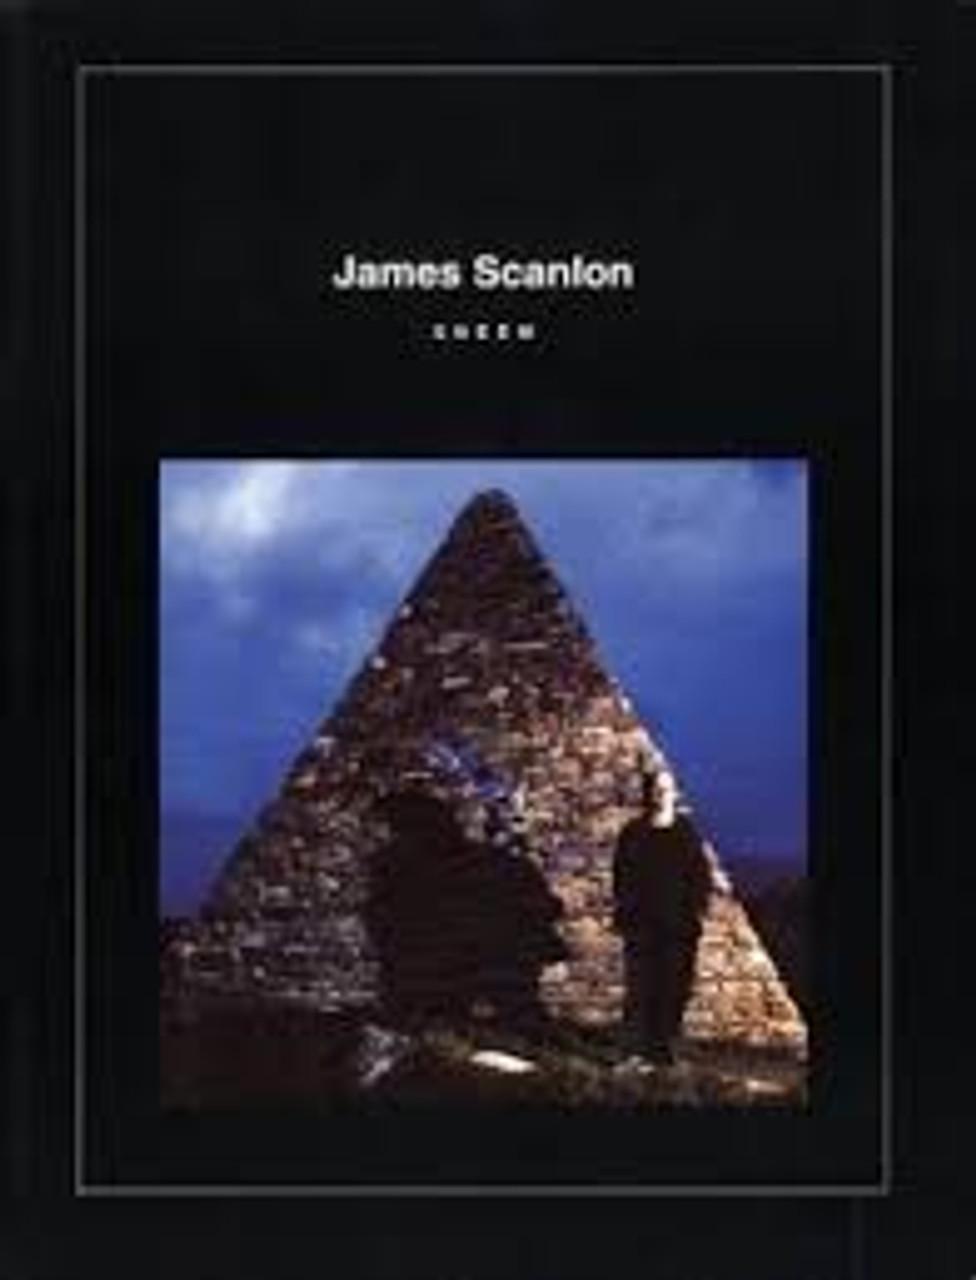 O'Regan, John - James Scanlon : Sneem - Gandon Editions - Works 1 - Irish Artist